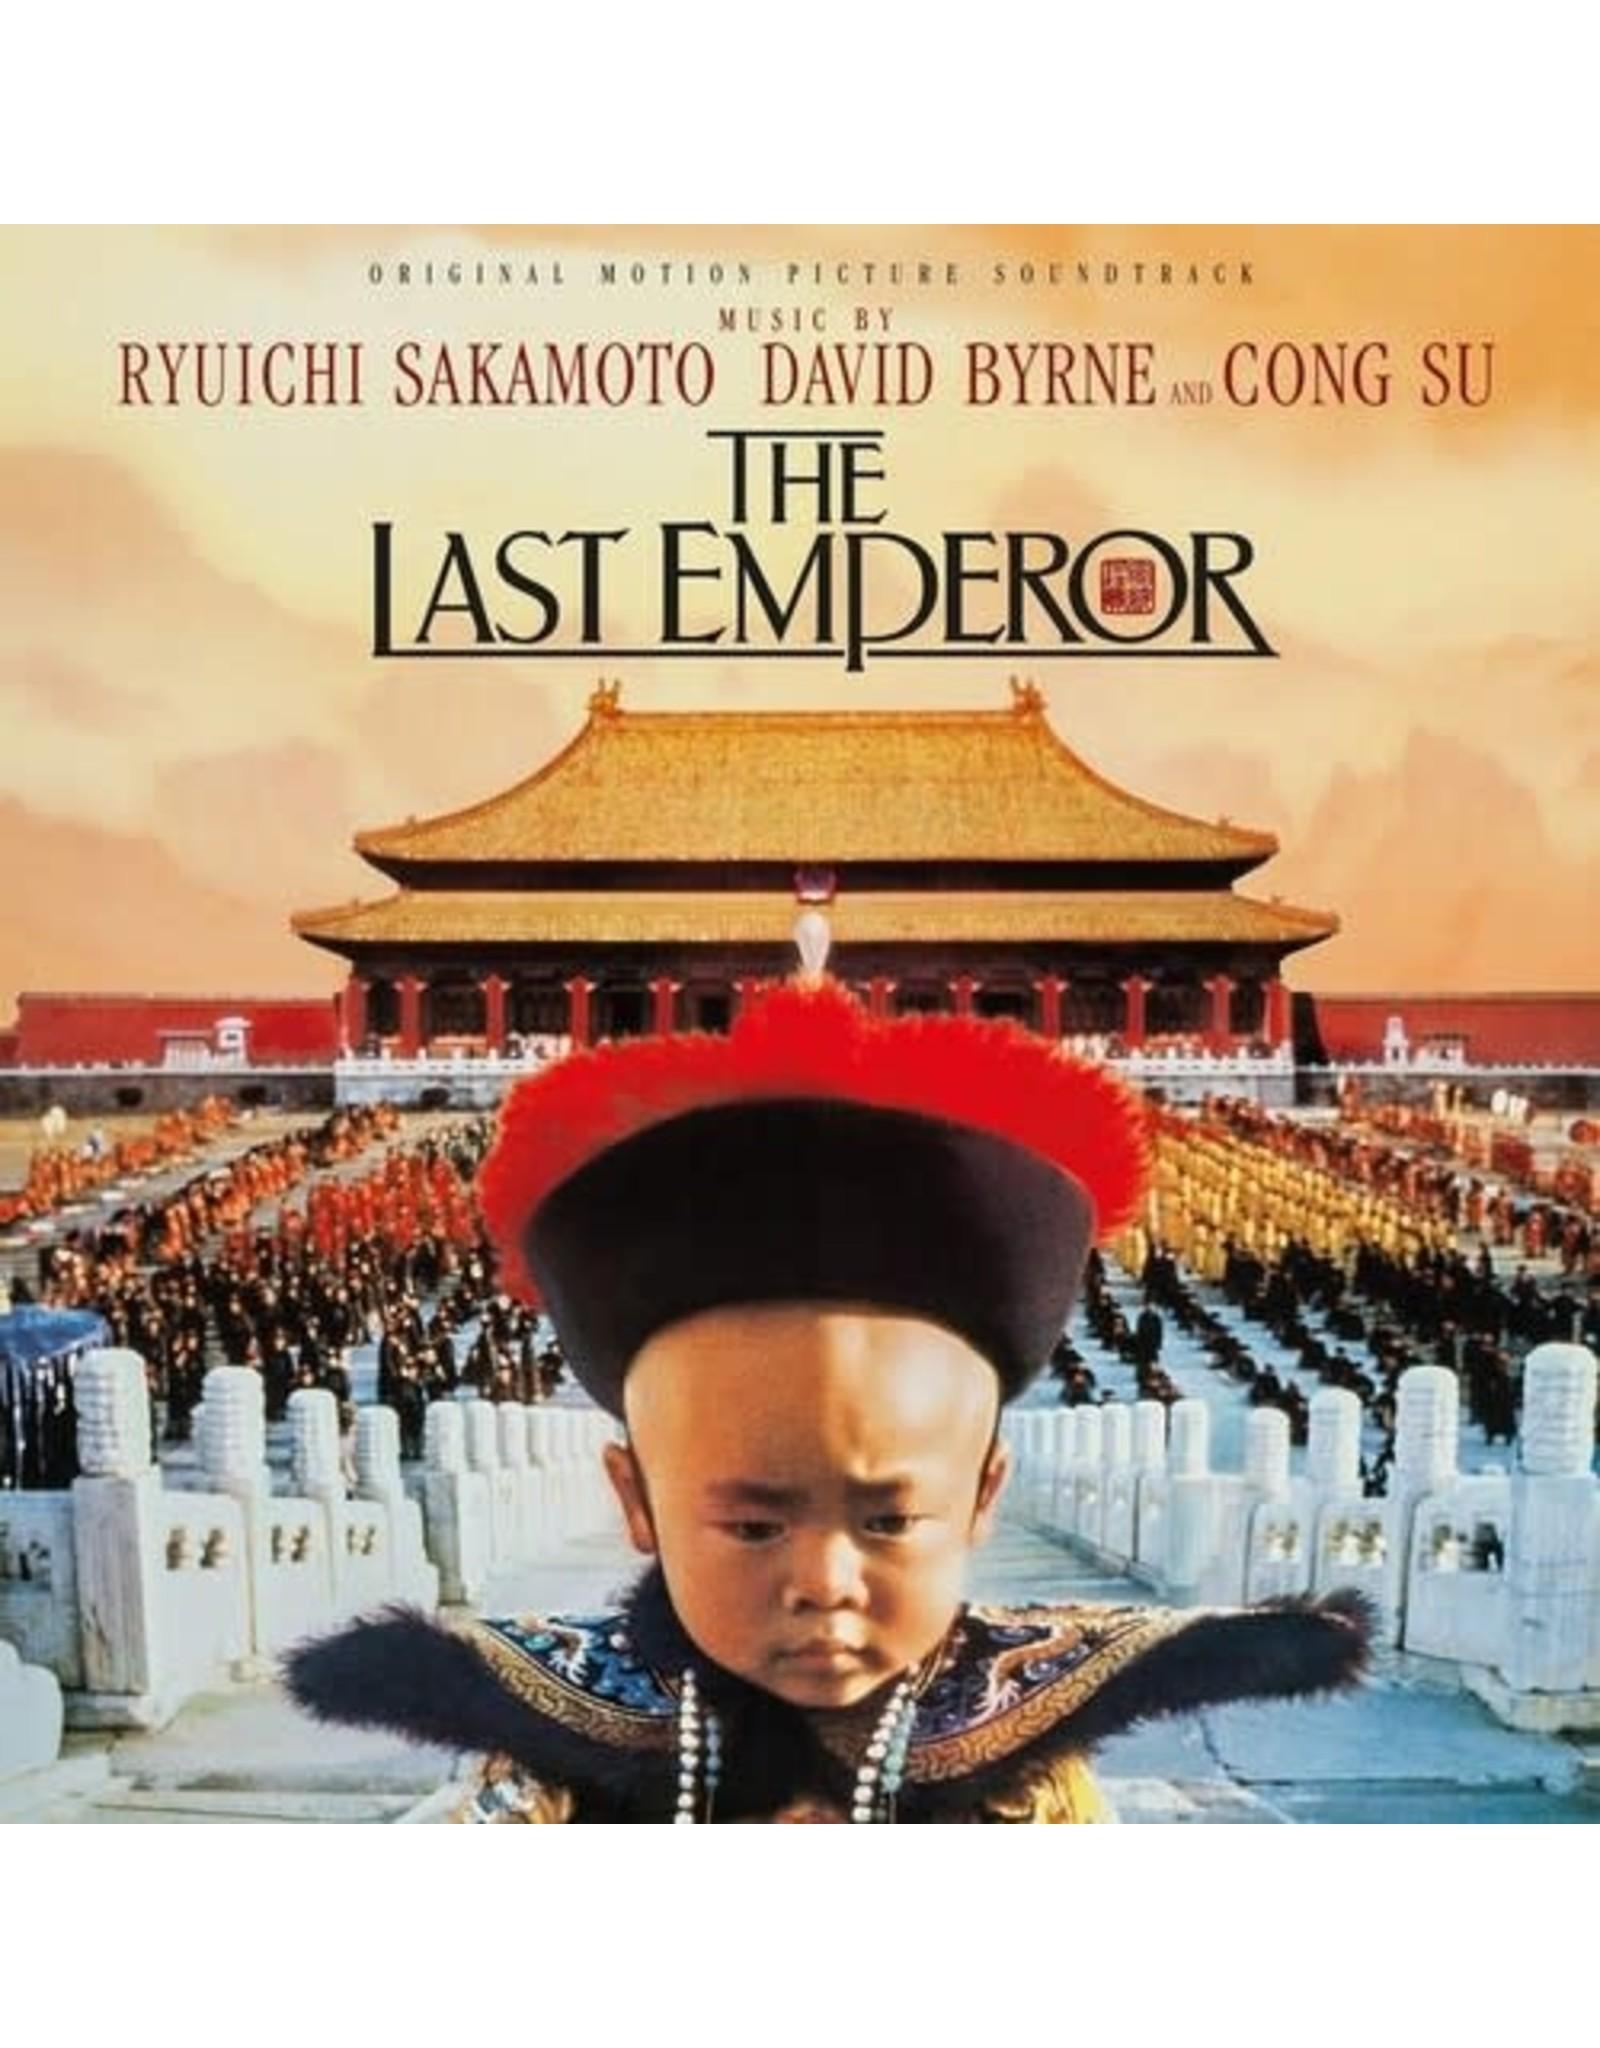 New Vinyl Ryuichi Sakamoto / David Byrne / Cong Su - The Last Emperor OST [Holland Import] LP